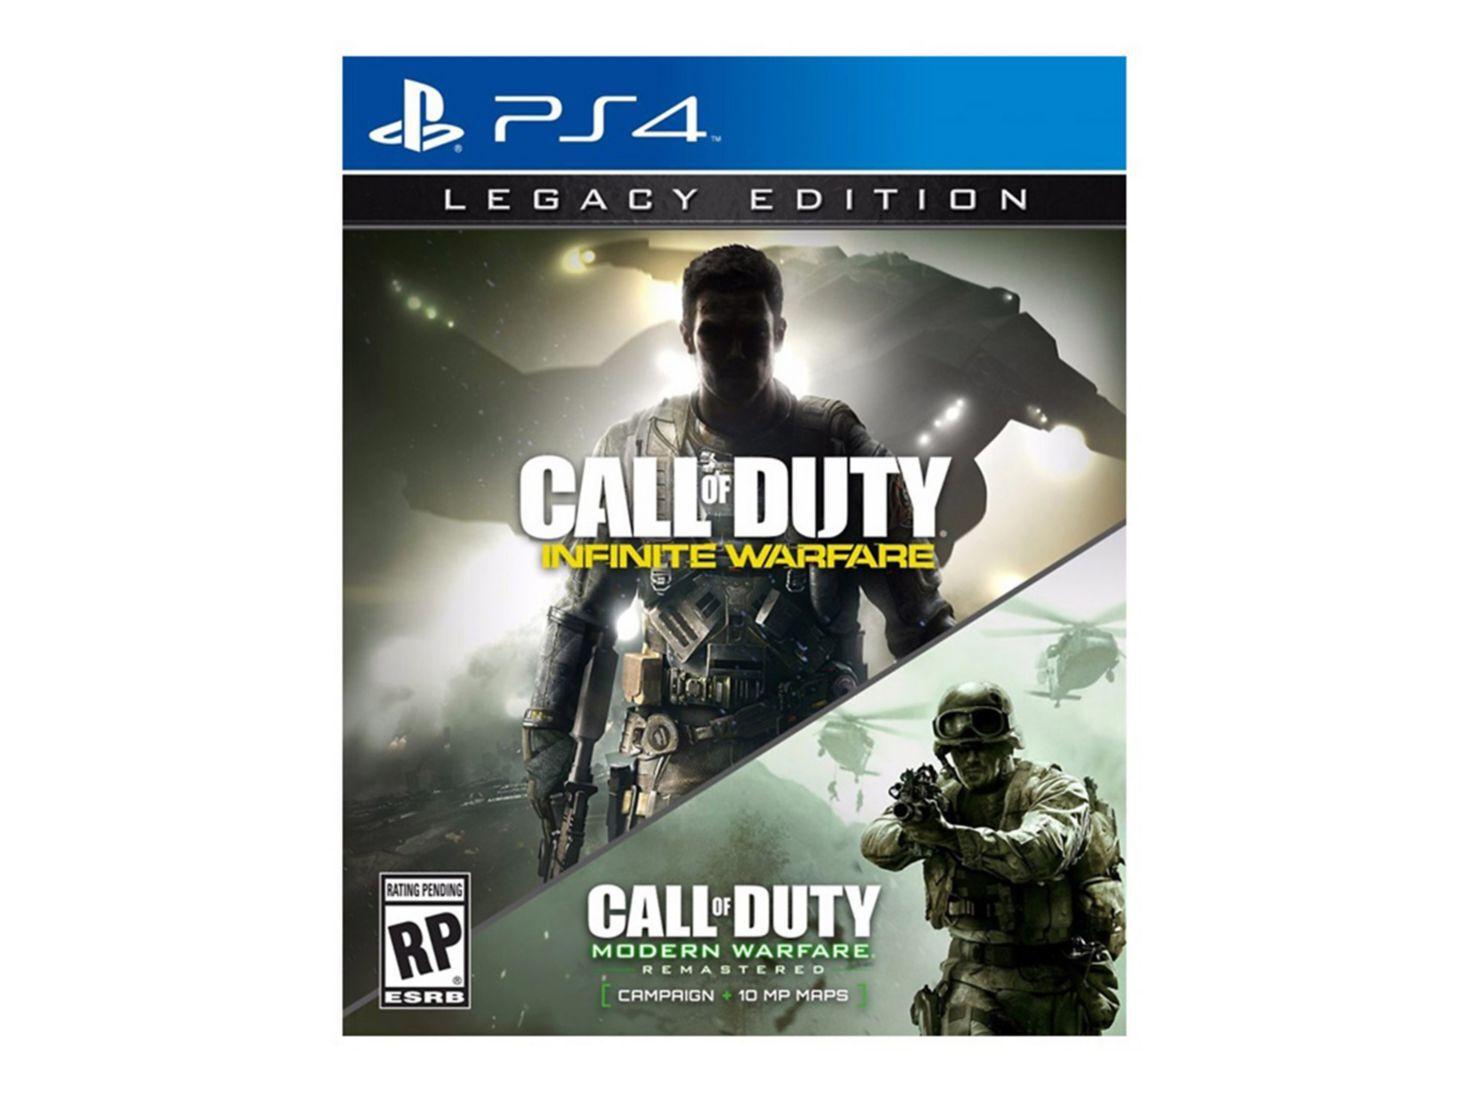 Juego Ps4 Call Of Duty Infinite Warfare Legacy Edition Juegos Ps4